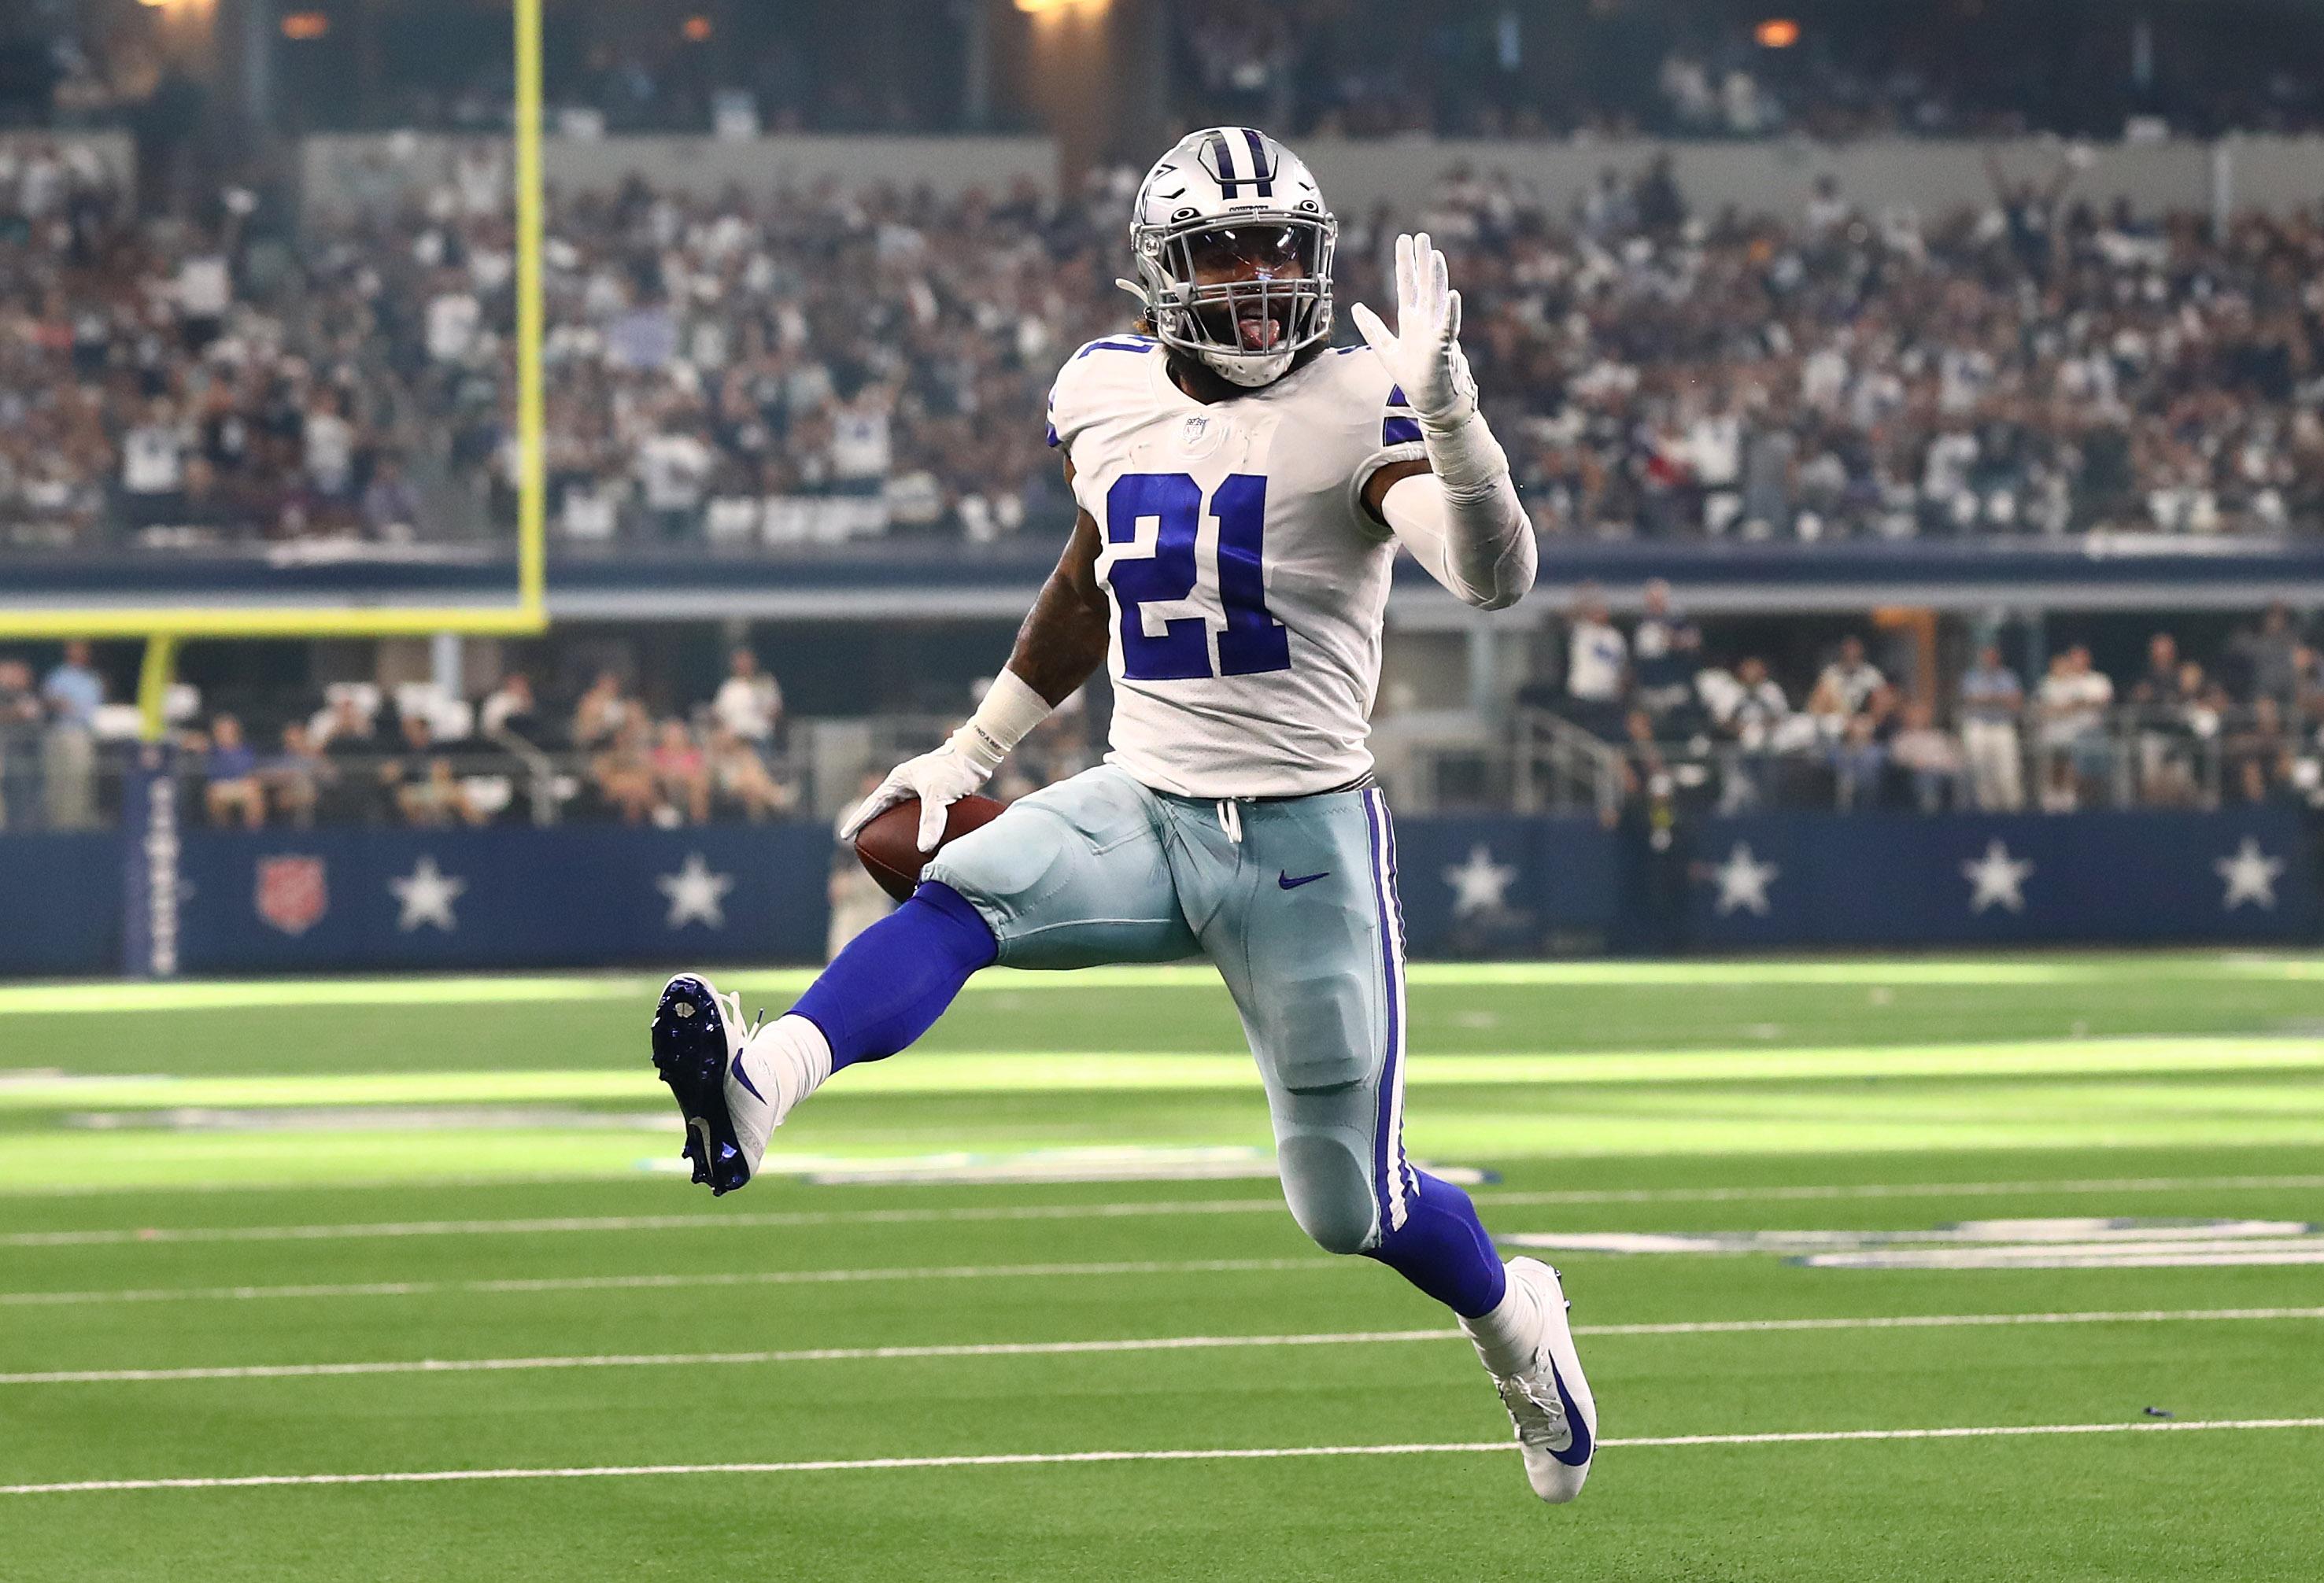 Dallas Cowboys running back Ezekiel Elliott (21) high steps as he scores a third quarter touchdown against the New York Giants at AT&T Stadium.